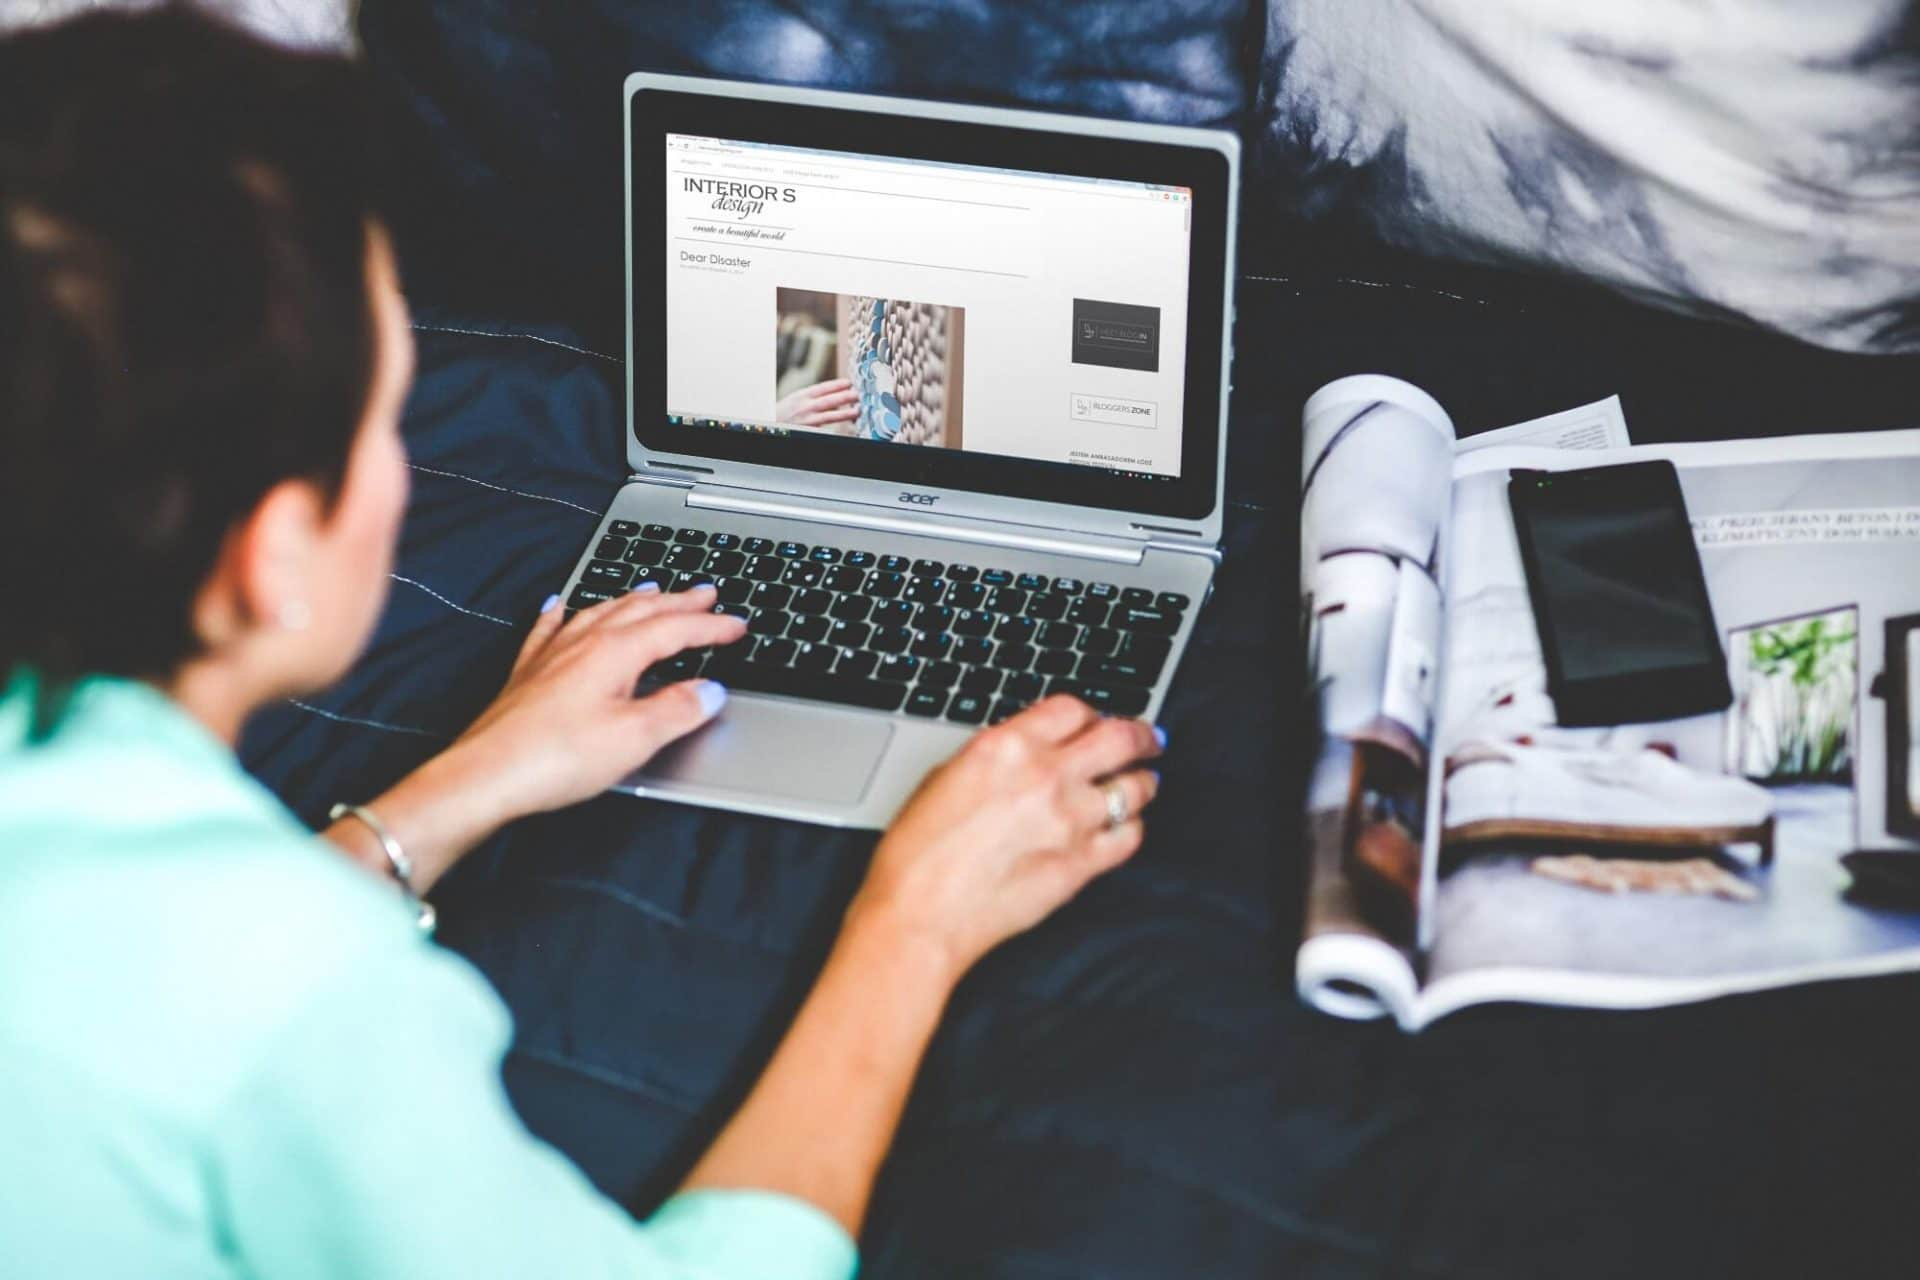 blogging, Blogging 101: How to Master Your Blogging & Writing Skills